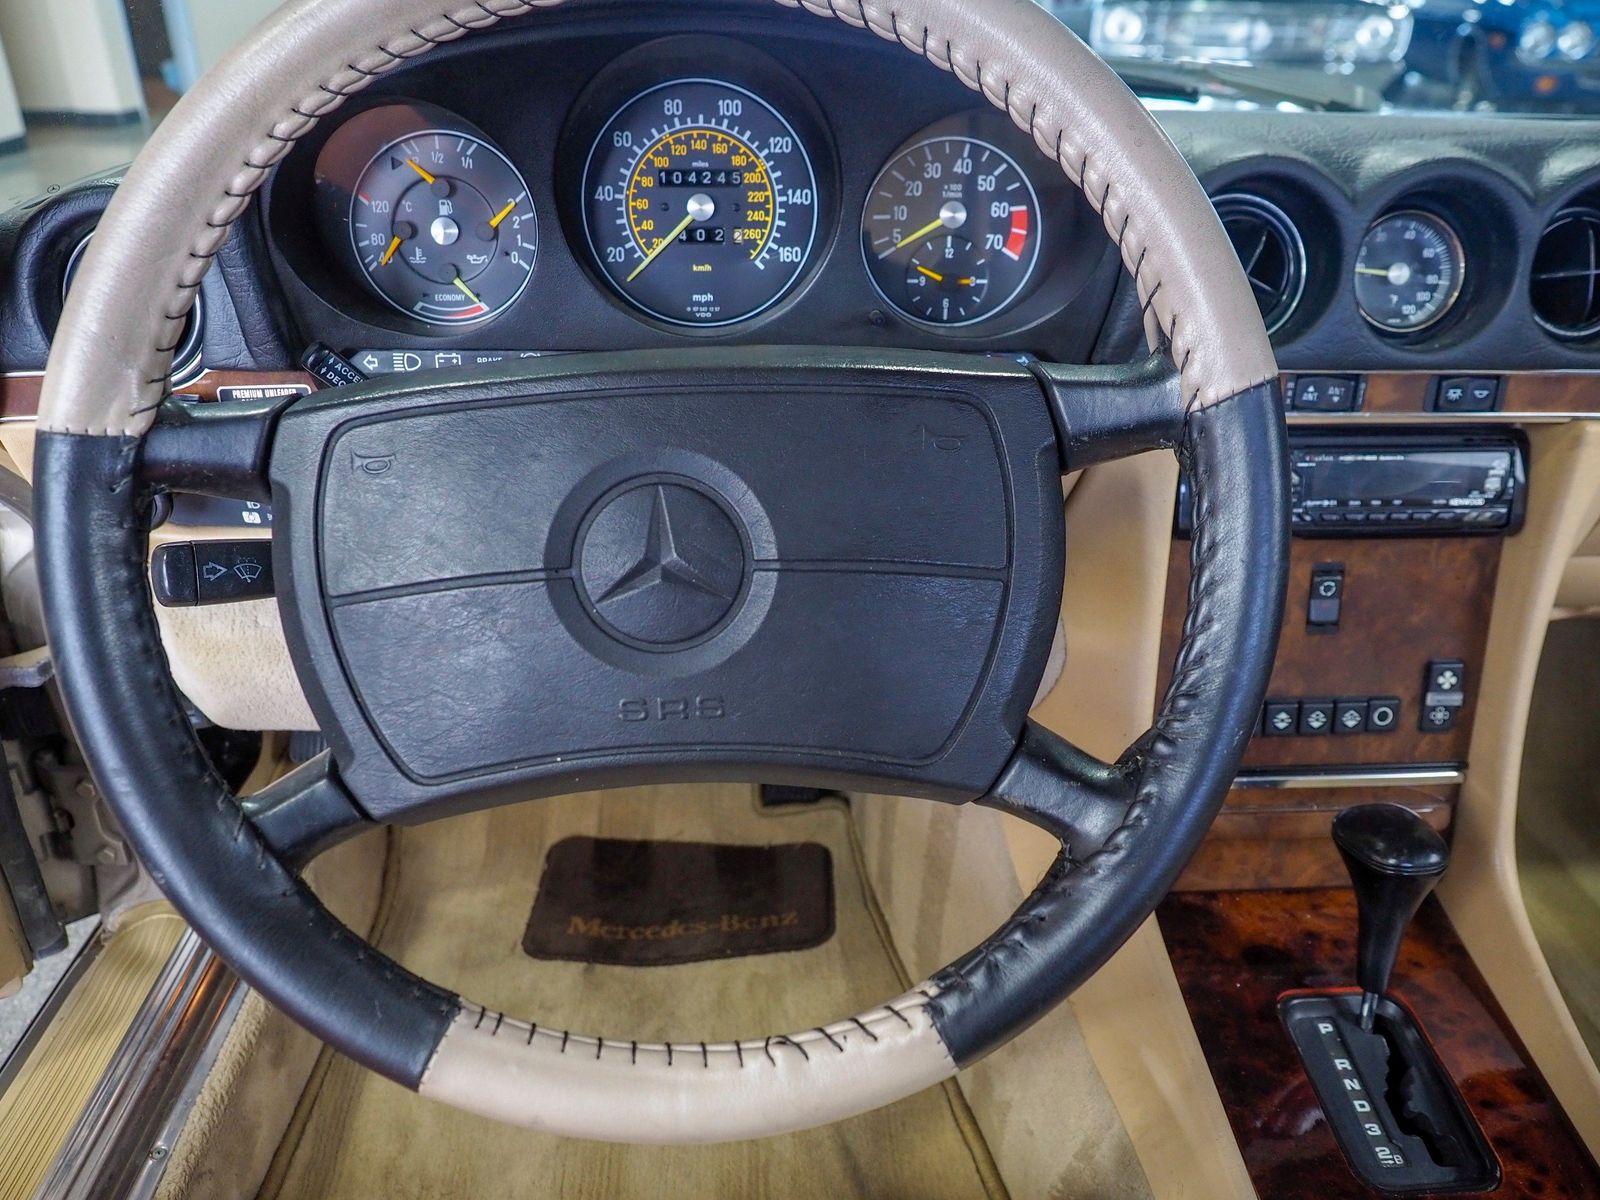 1988 Mercedes Benz 560 Class 560 SL For Sale